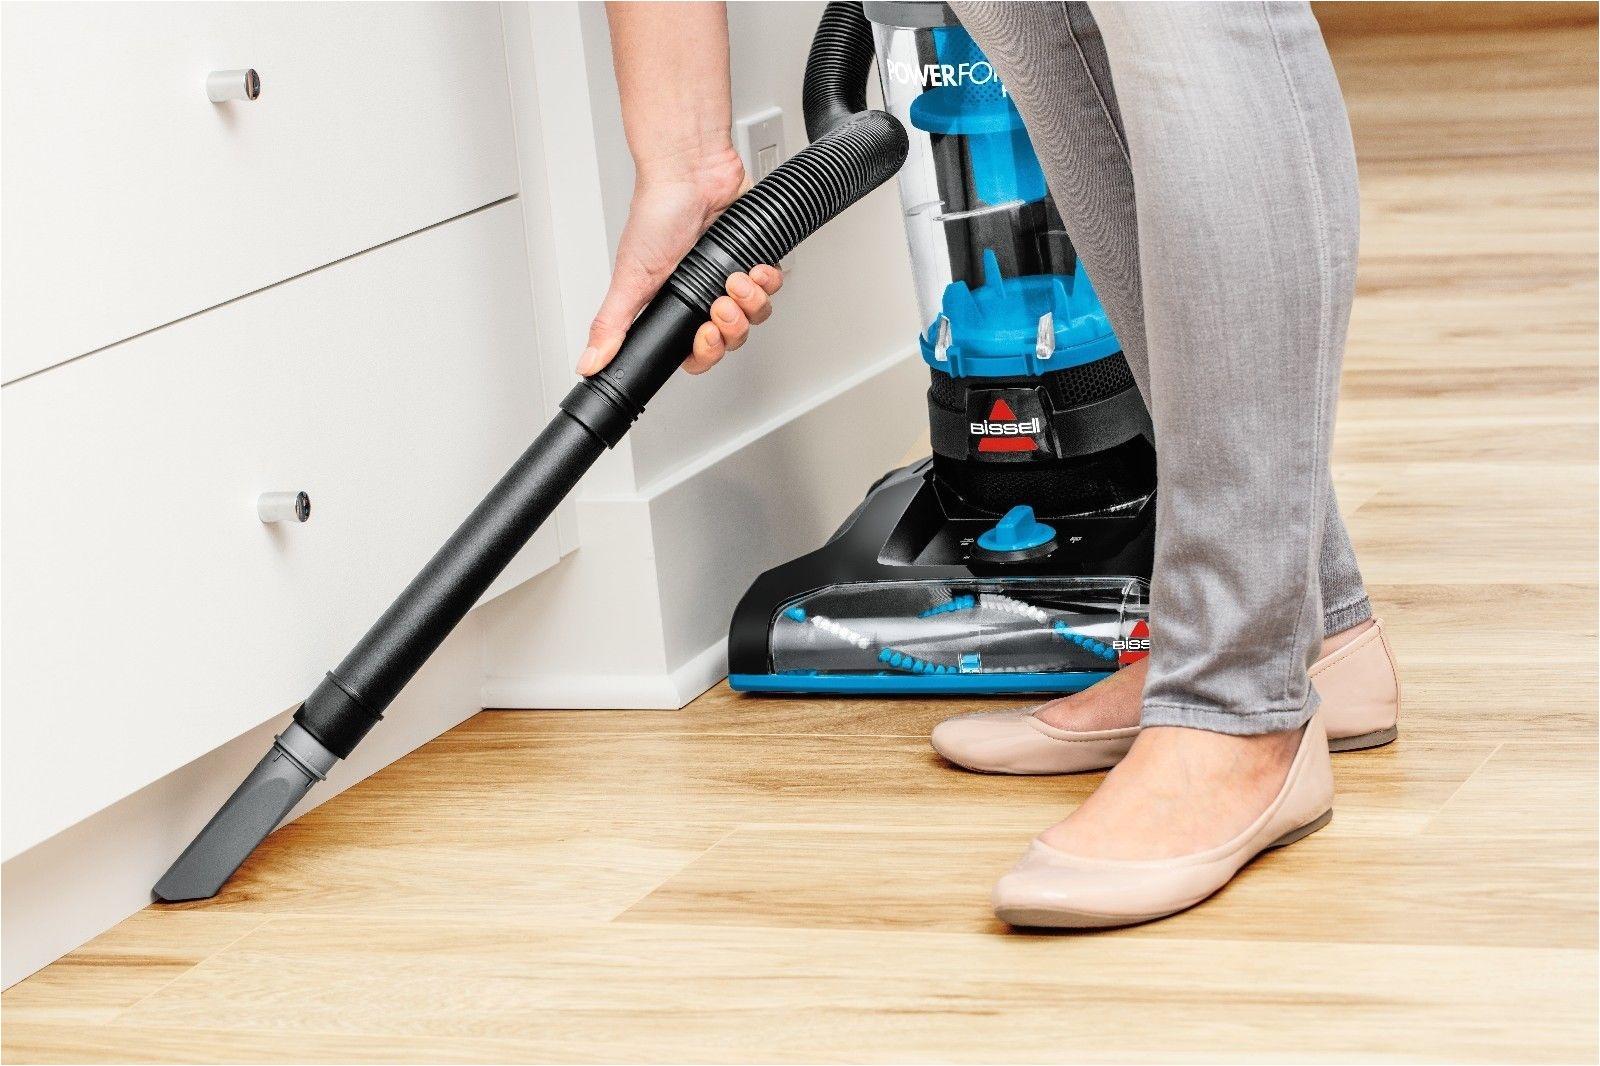 bissell powerforce helix bagless vacuum 1700 improved version of 1240 ebay